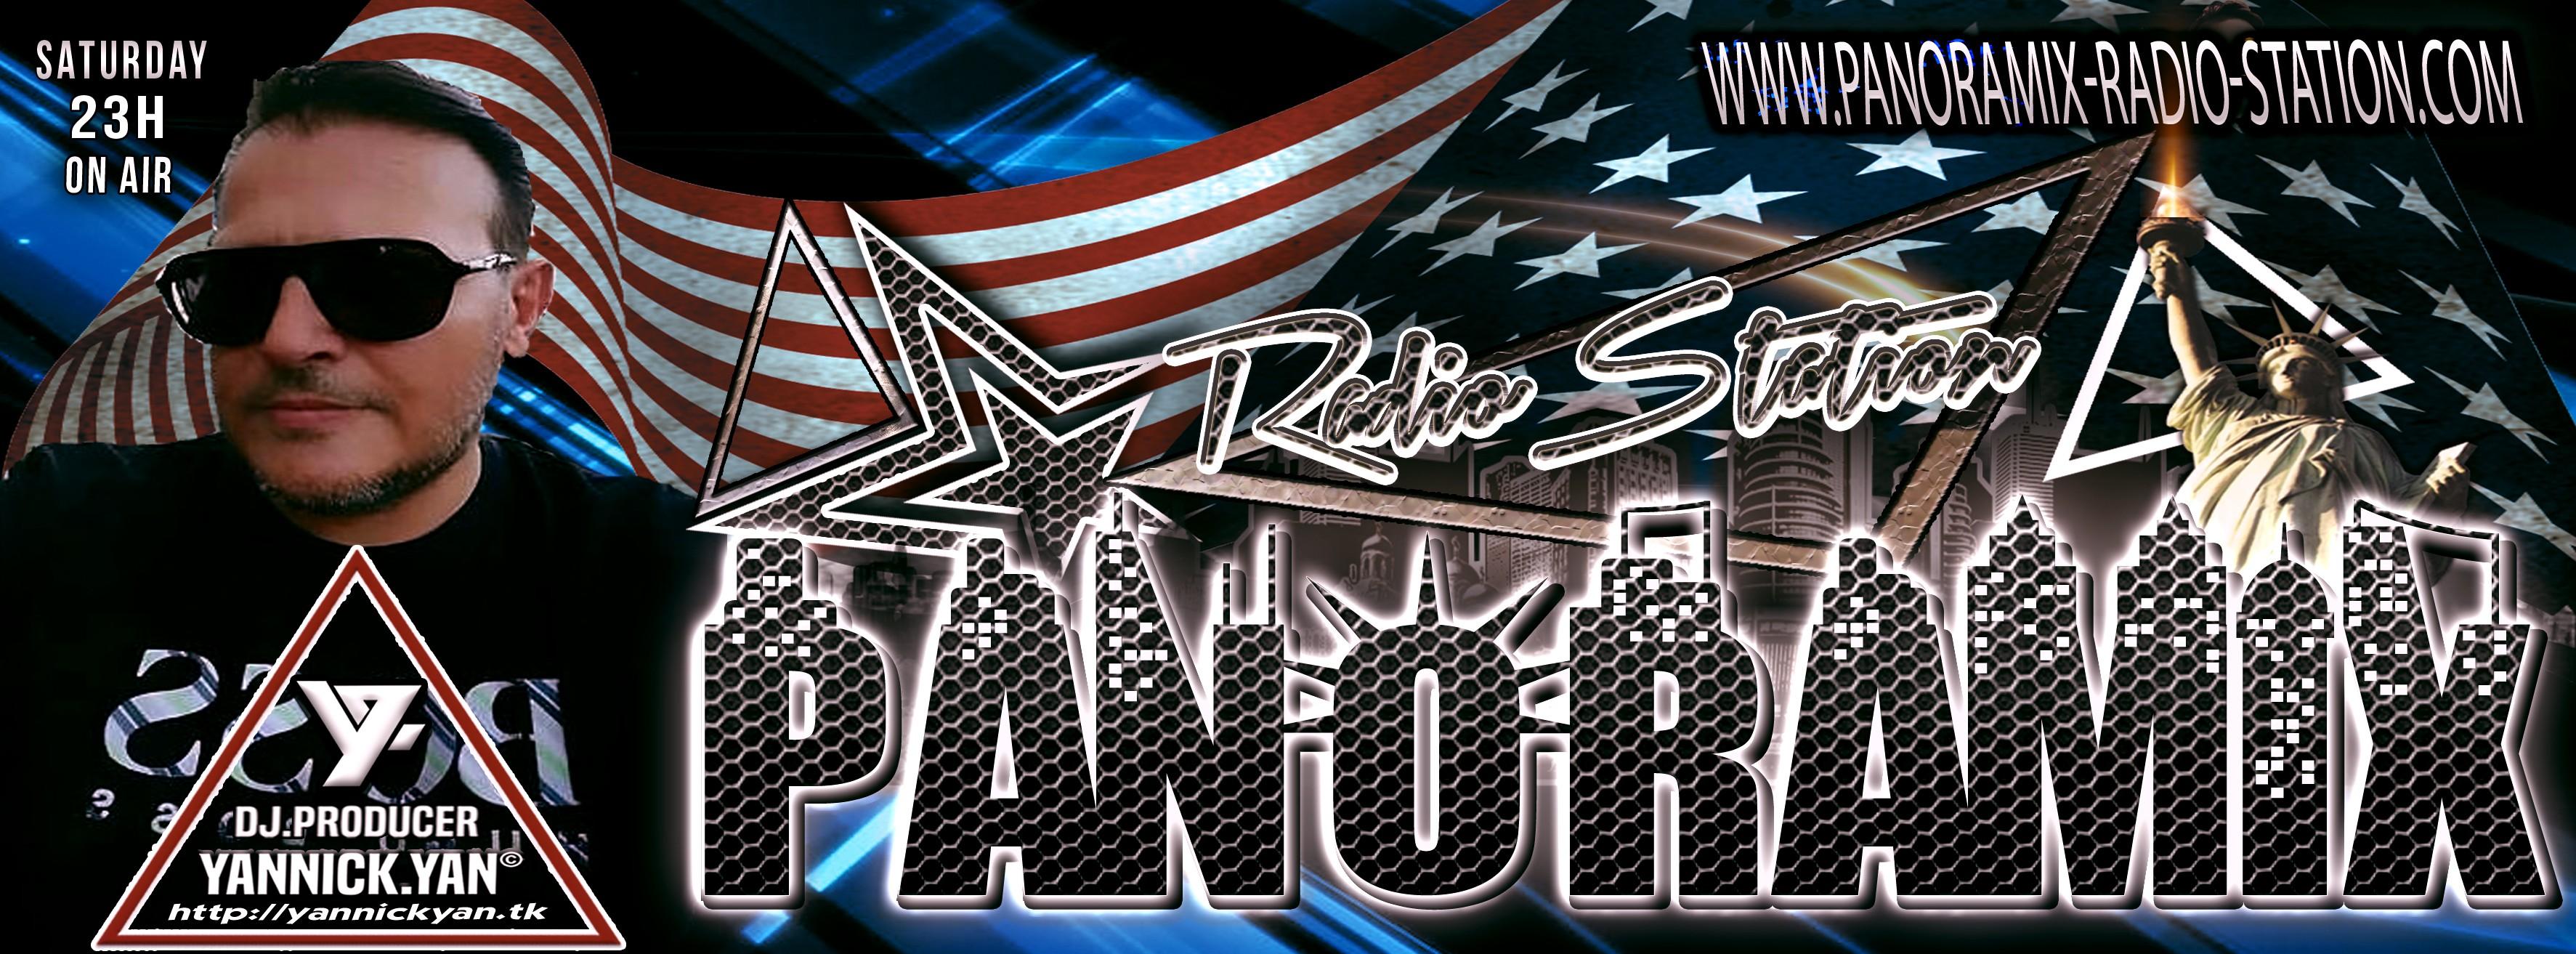 http://panoramix-radio-station.com/wp-content/uploads/2016/12/YY-USA-1-bannier-2017-PANO.jpg